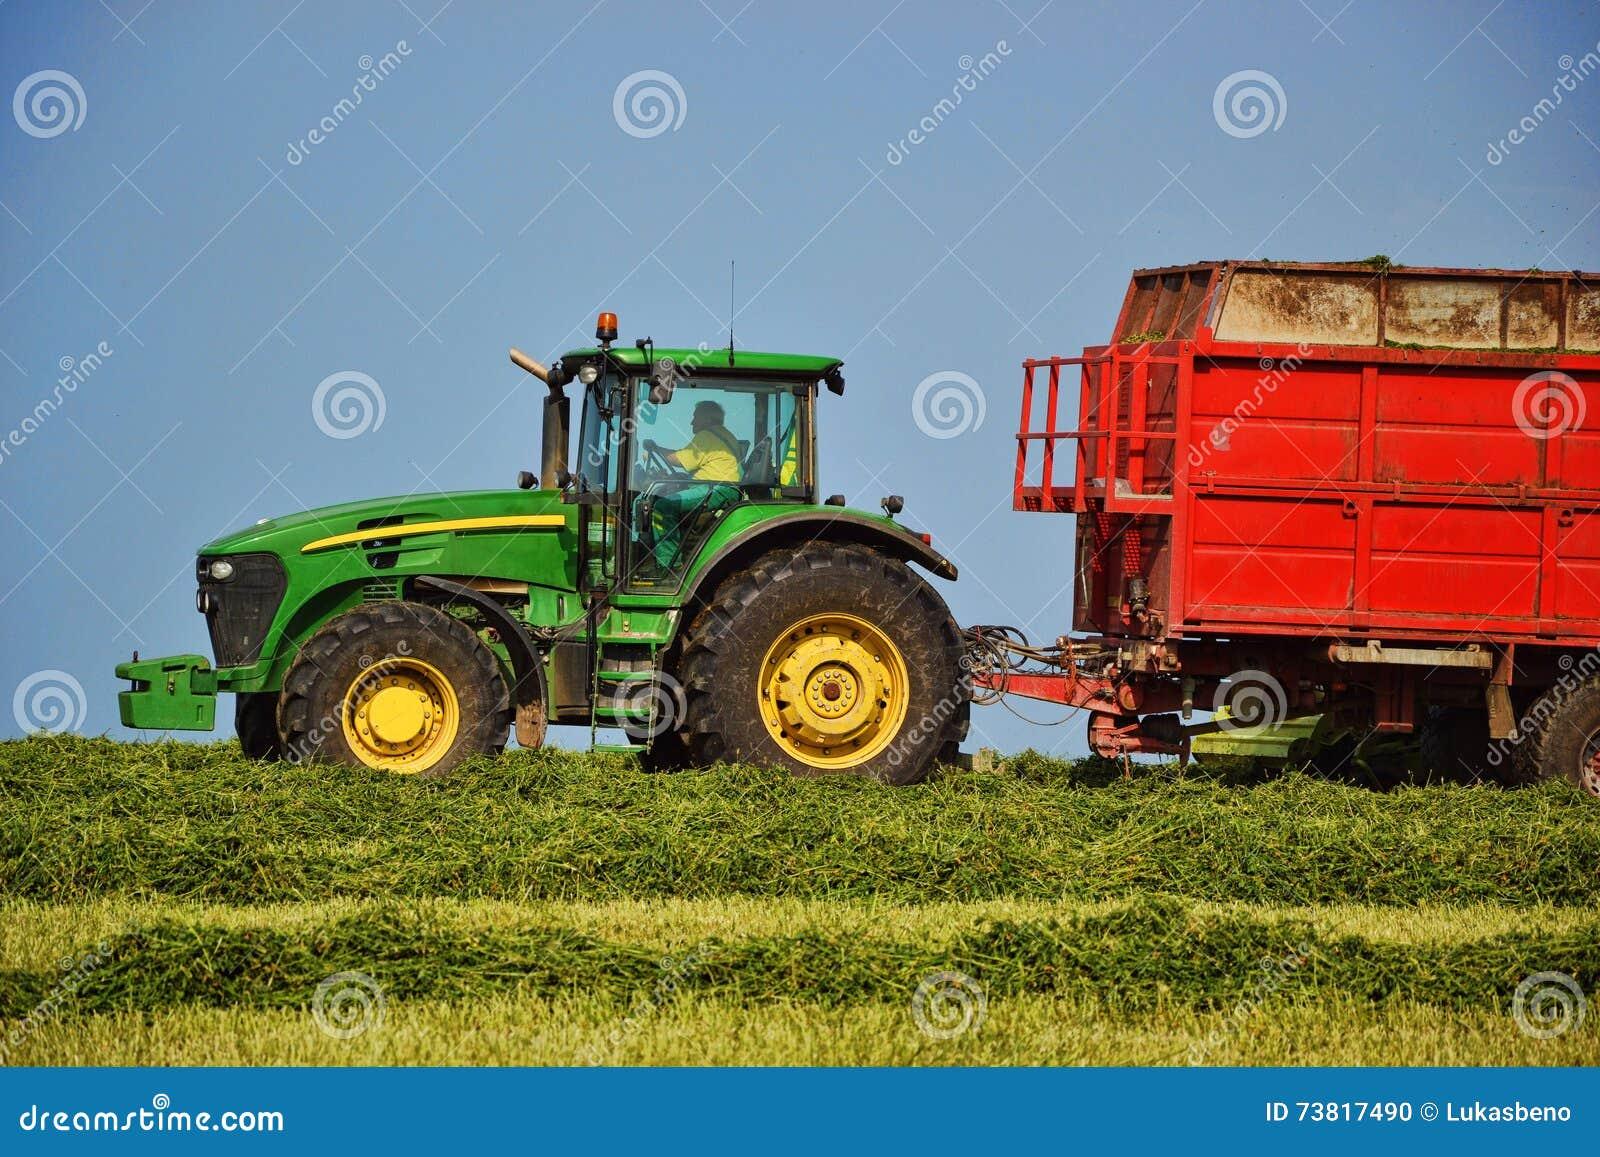 Tractor Cartoon Picker : Harvester unloading into a tractor trailer combine